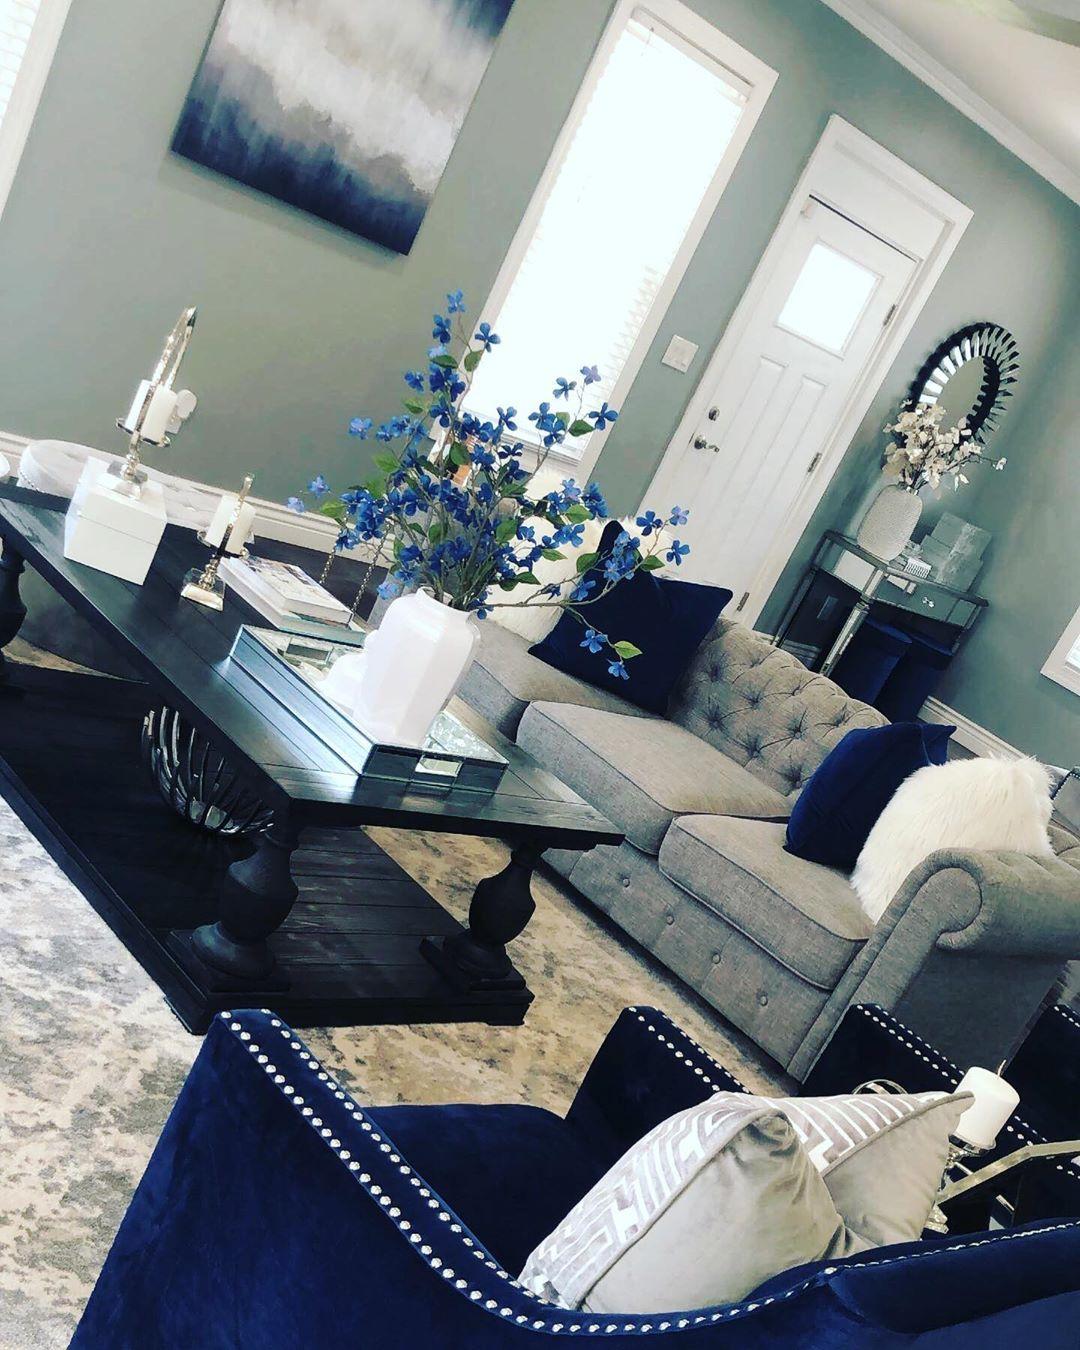 Jusminda On Instagram Happy Sunday Hope Everyone Had A Great Weekend Living Room Decor Grey And Blue Living Room Decor Apartment Decor Home Living Room